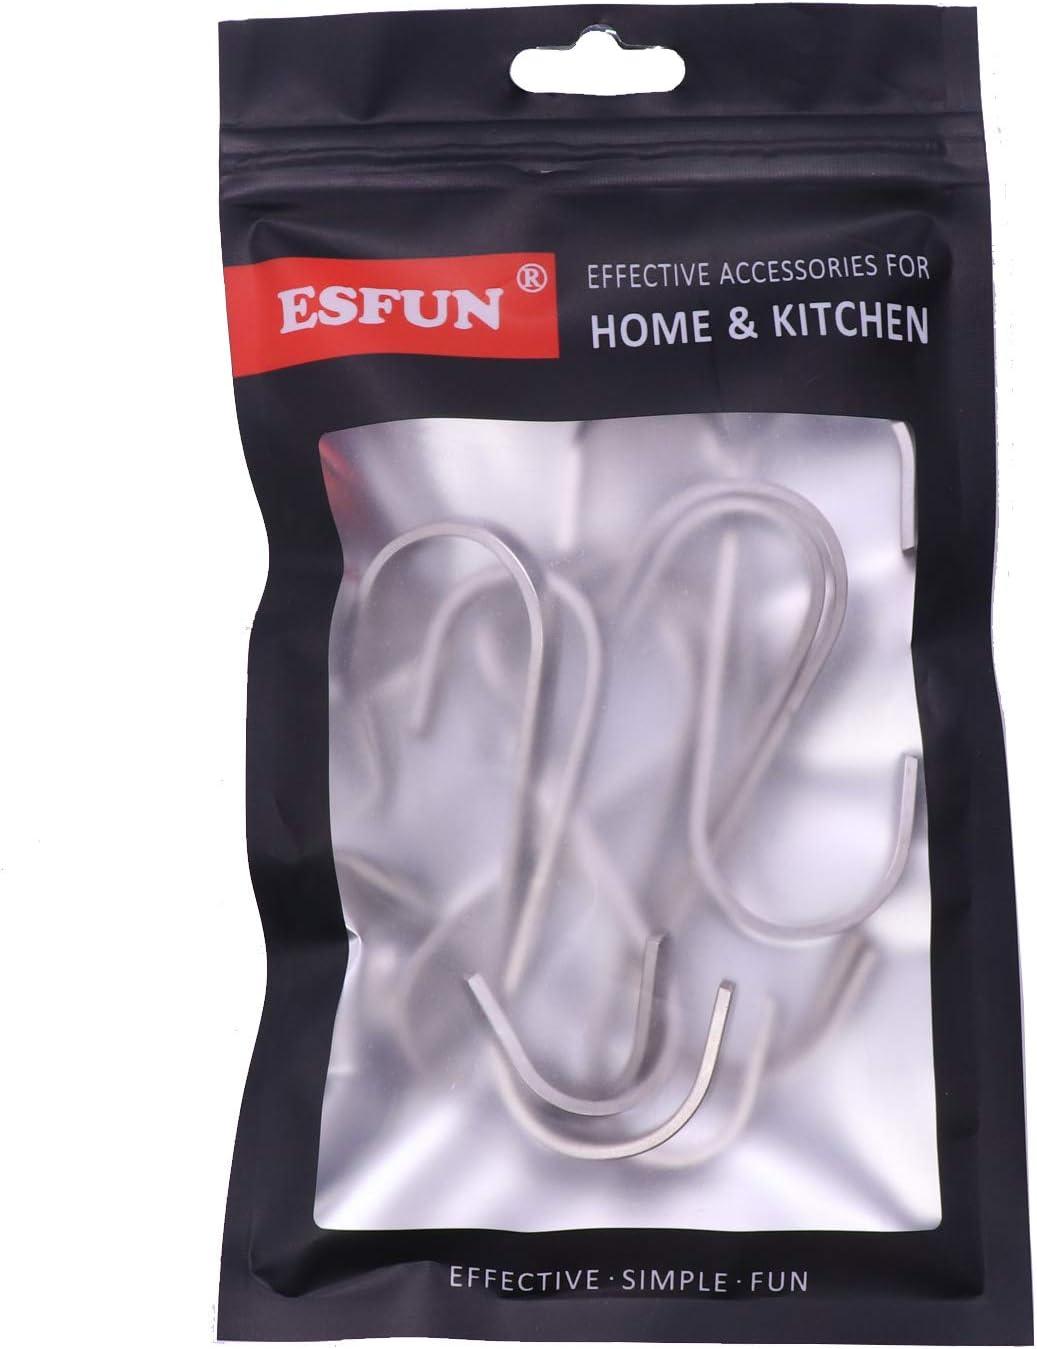 Esfun 20 Pack Size Medium 3 inch Flat S Hooks Heavy Duty Solid 304 Stainless Steel S Shaped Hanging Hooks,Metal Kitchen Pot Pan Hangers Rack Hooks